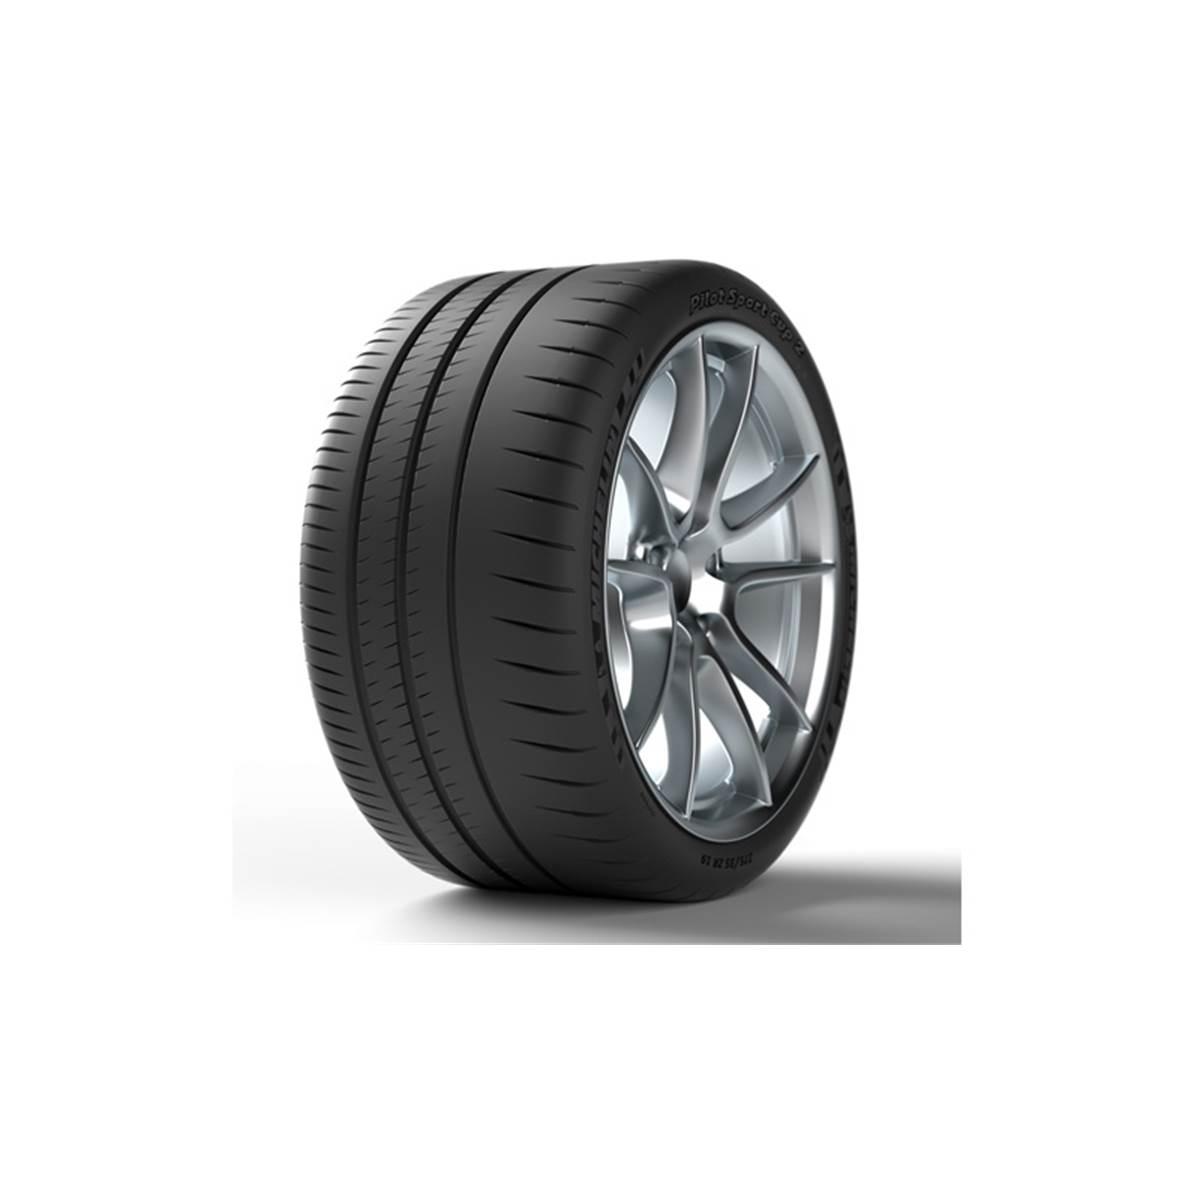 Pneu Michelin 285/35R19 103Y Pilot Sport Cup 2 XL